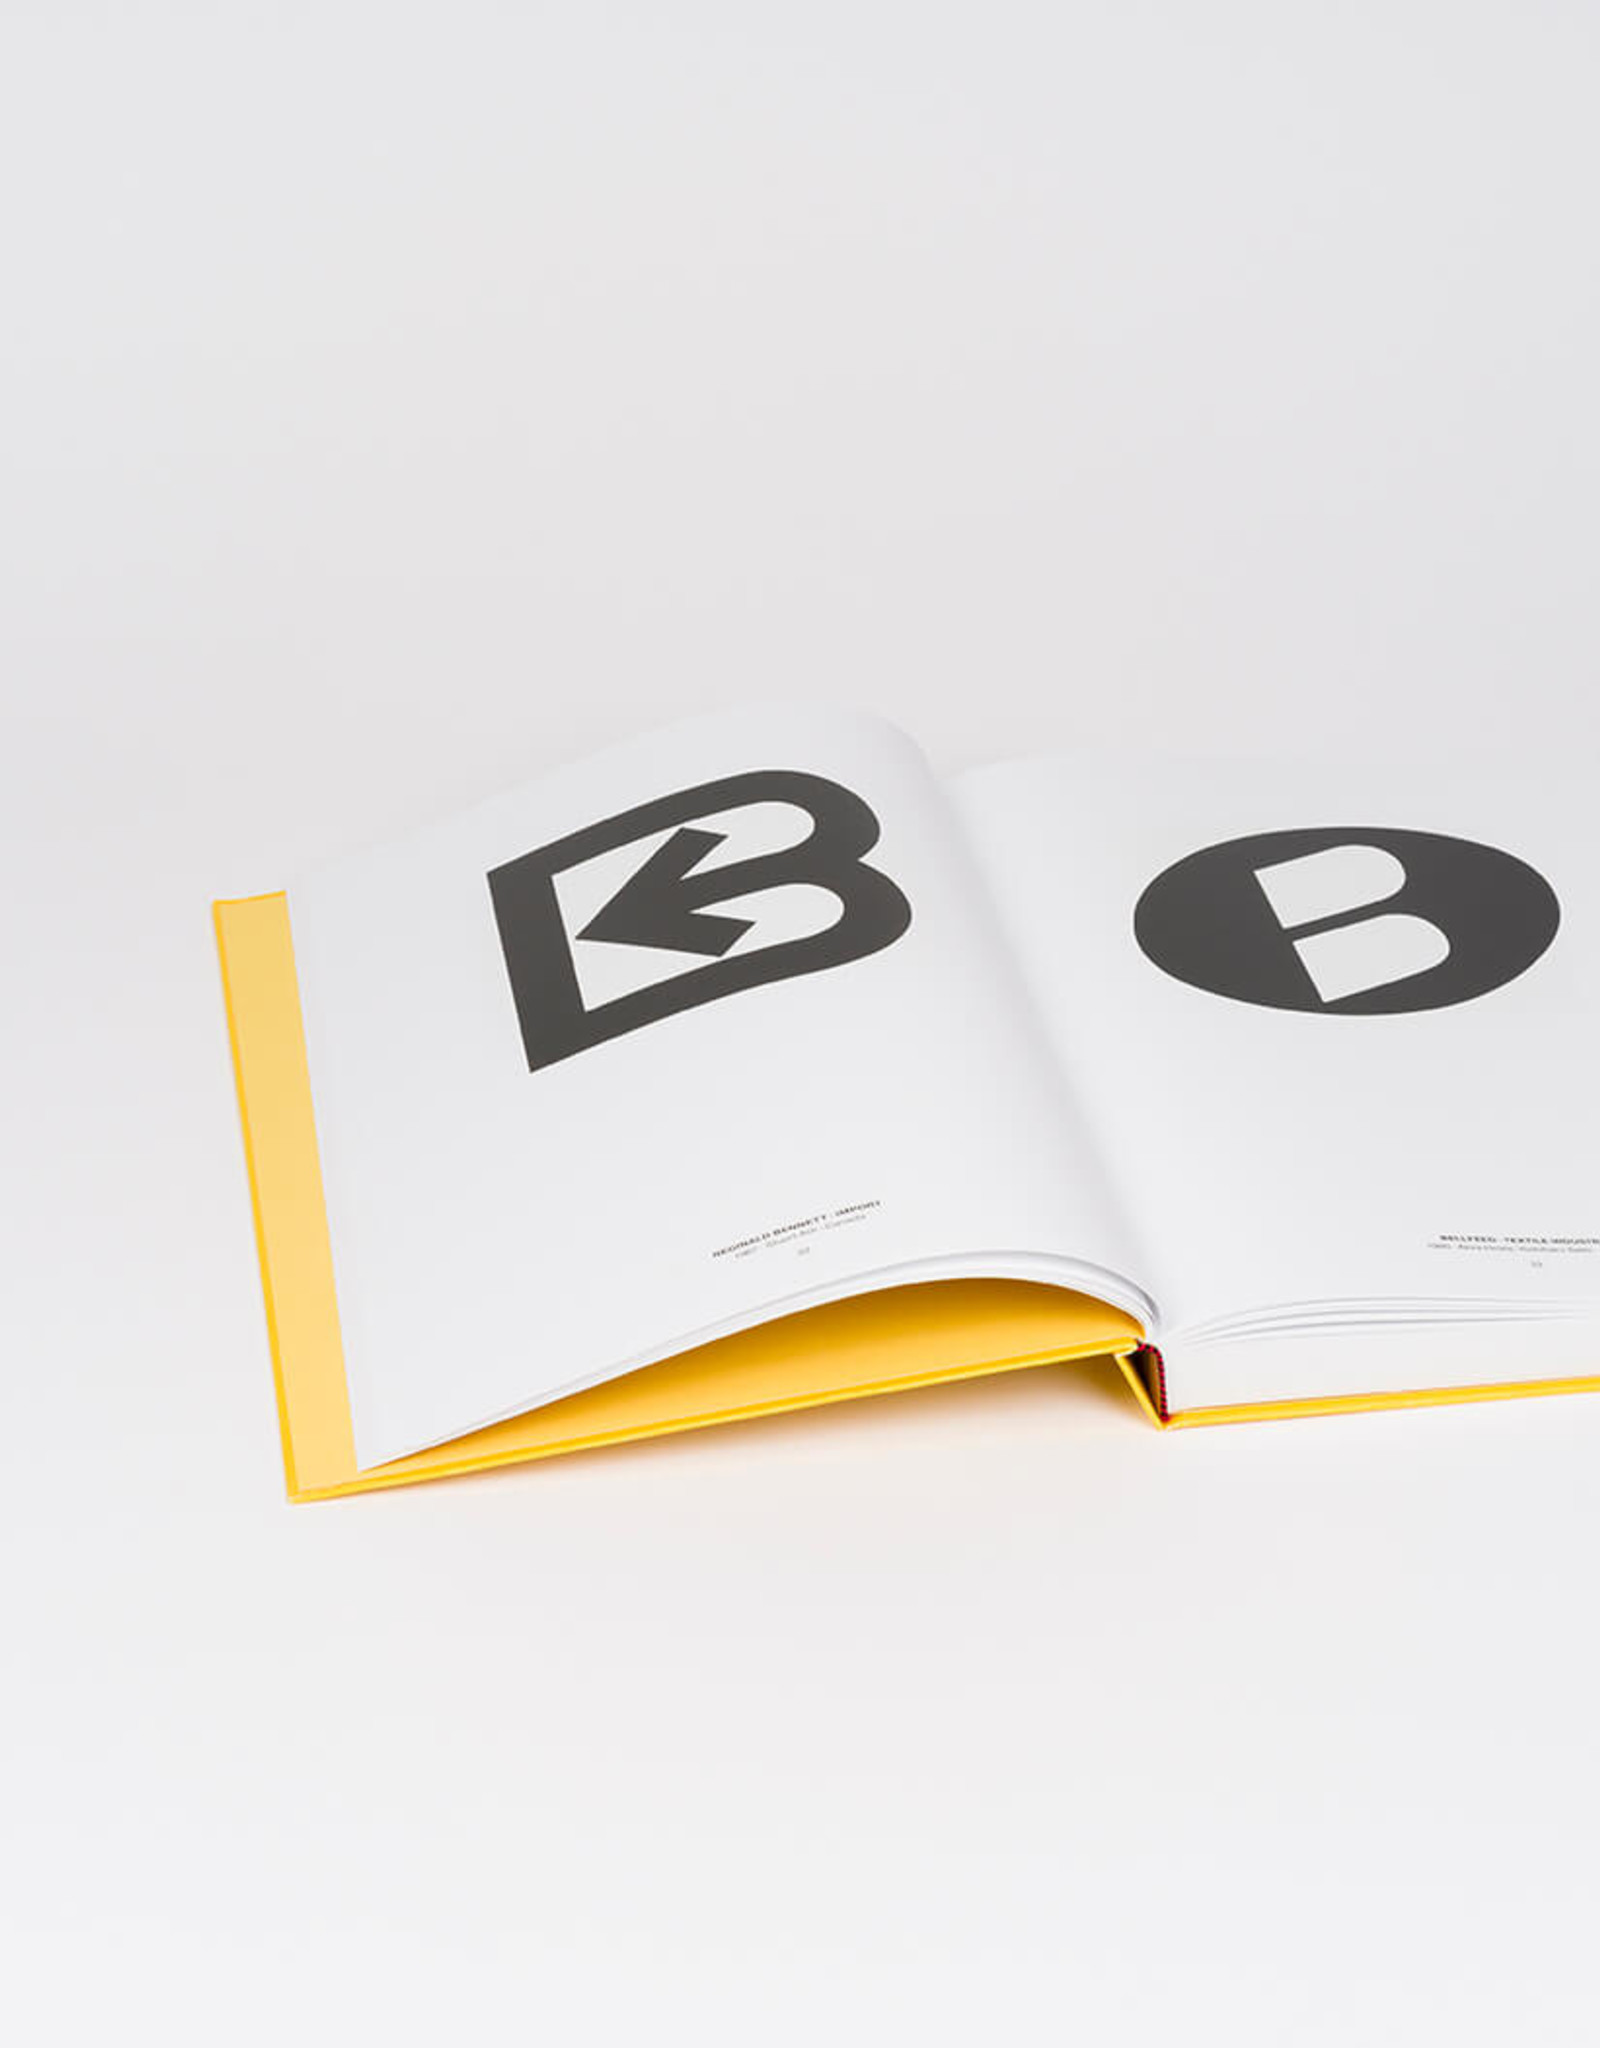 Christophe De Pelsemaker & Paul Ibou - Letters as Symbols - International collection of lettermarks